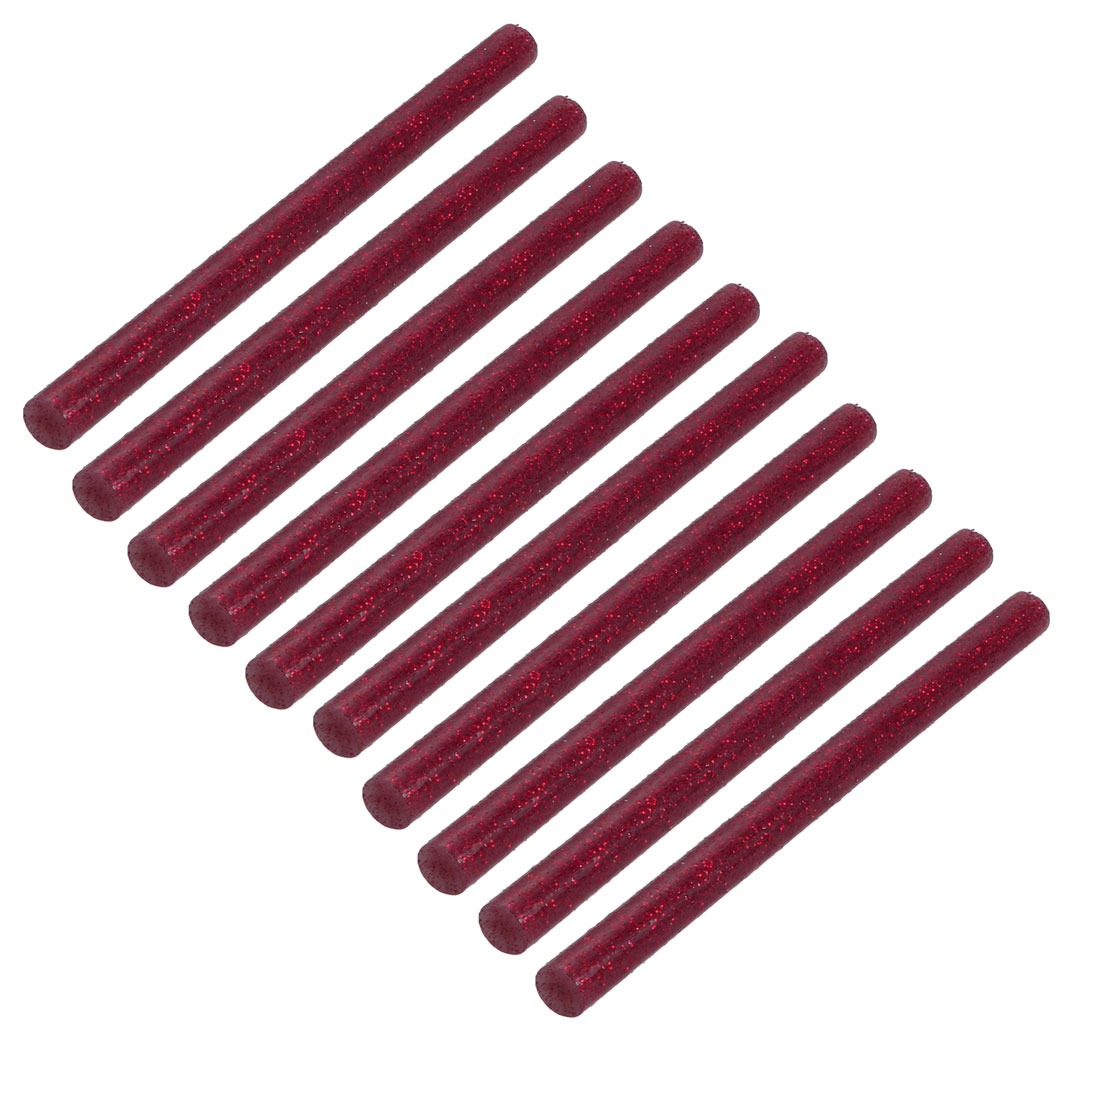 10pcs 7mm Dia 100mm Length Hot Melt Glue Adhesive Stick Shinning Red